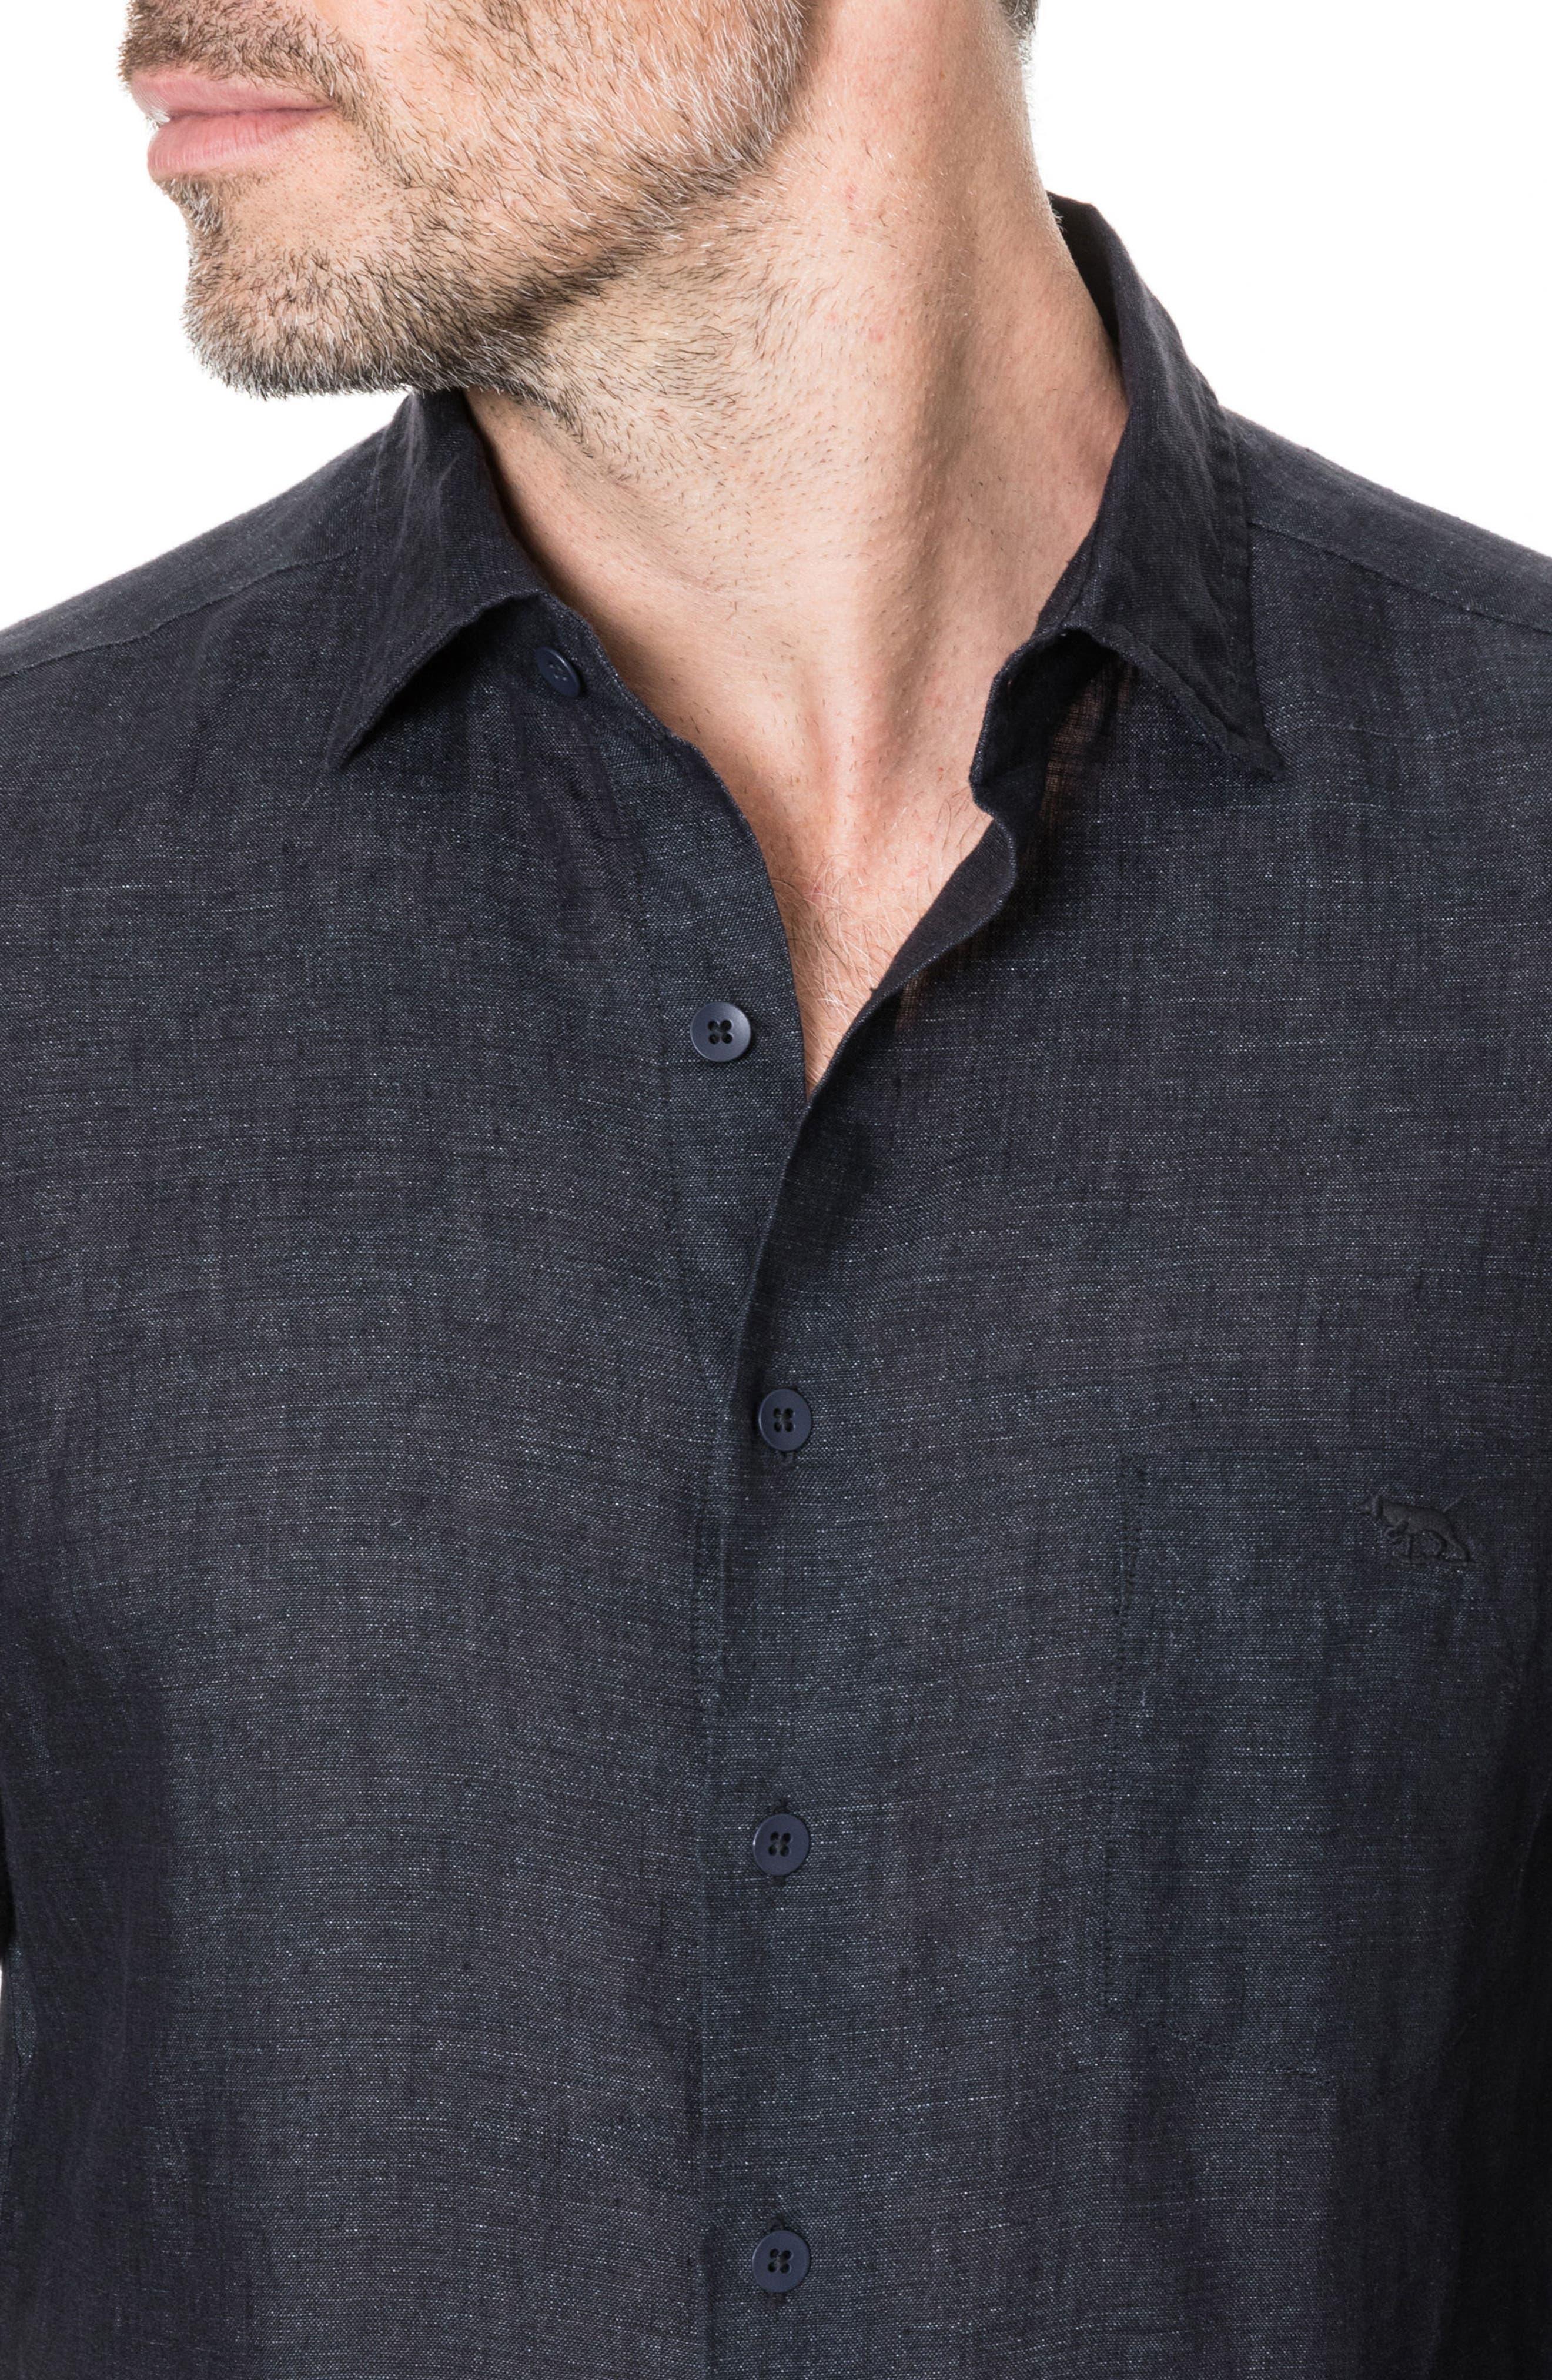 Landsdown Regular Fit Linen Sport Shirt,                             Alternate thumbnail 2, color,                             Charcoal